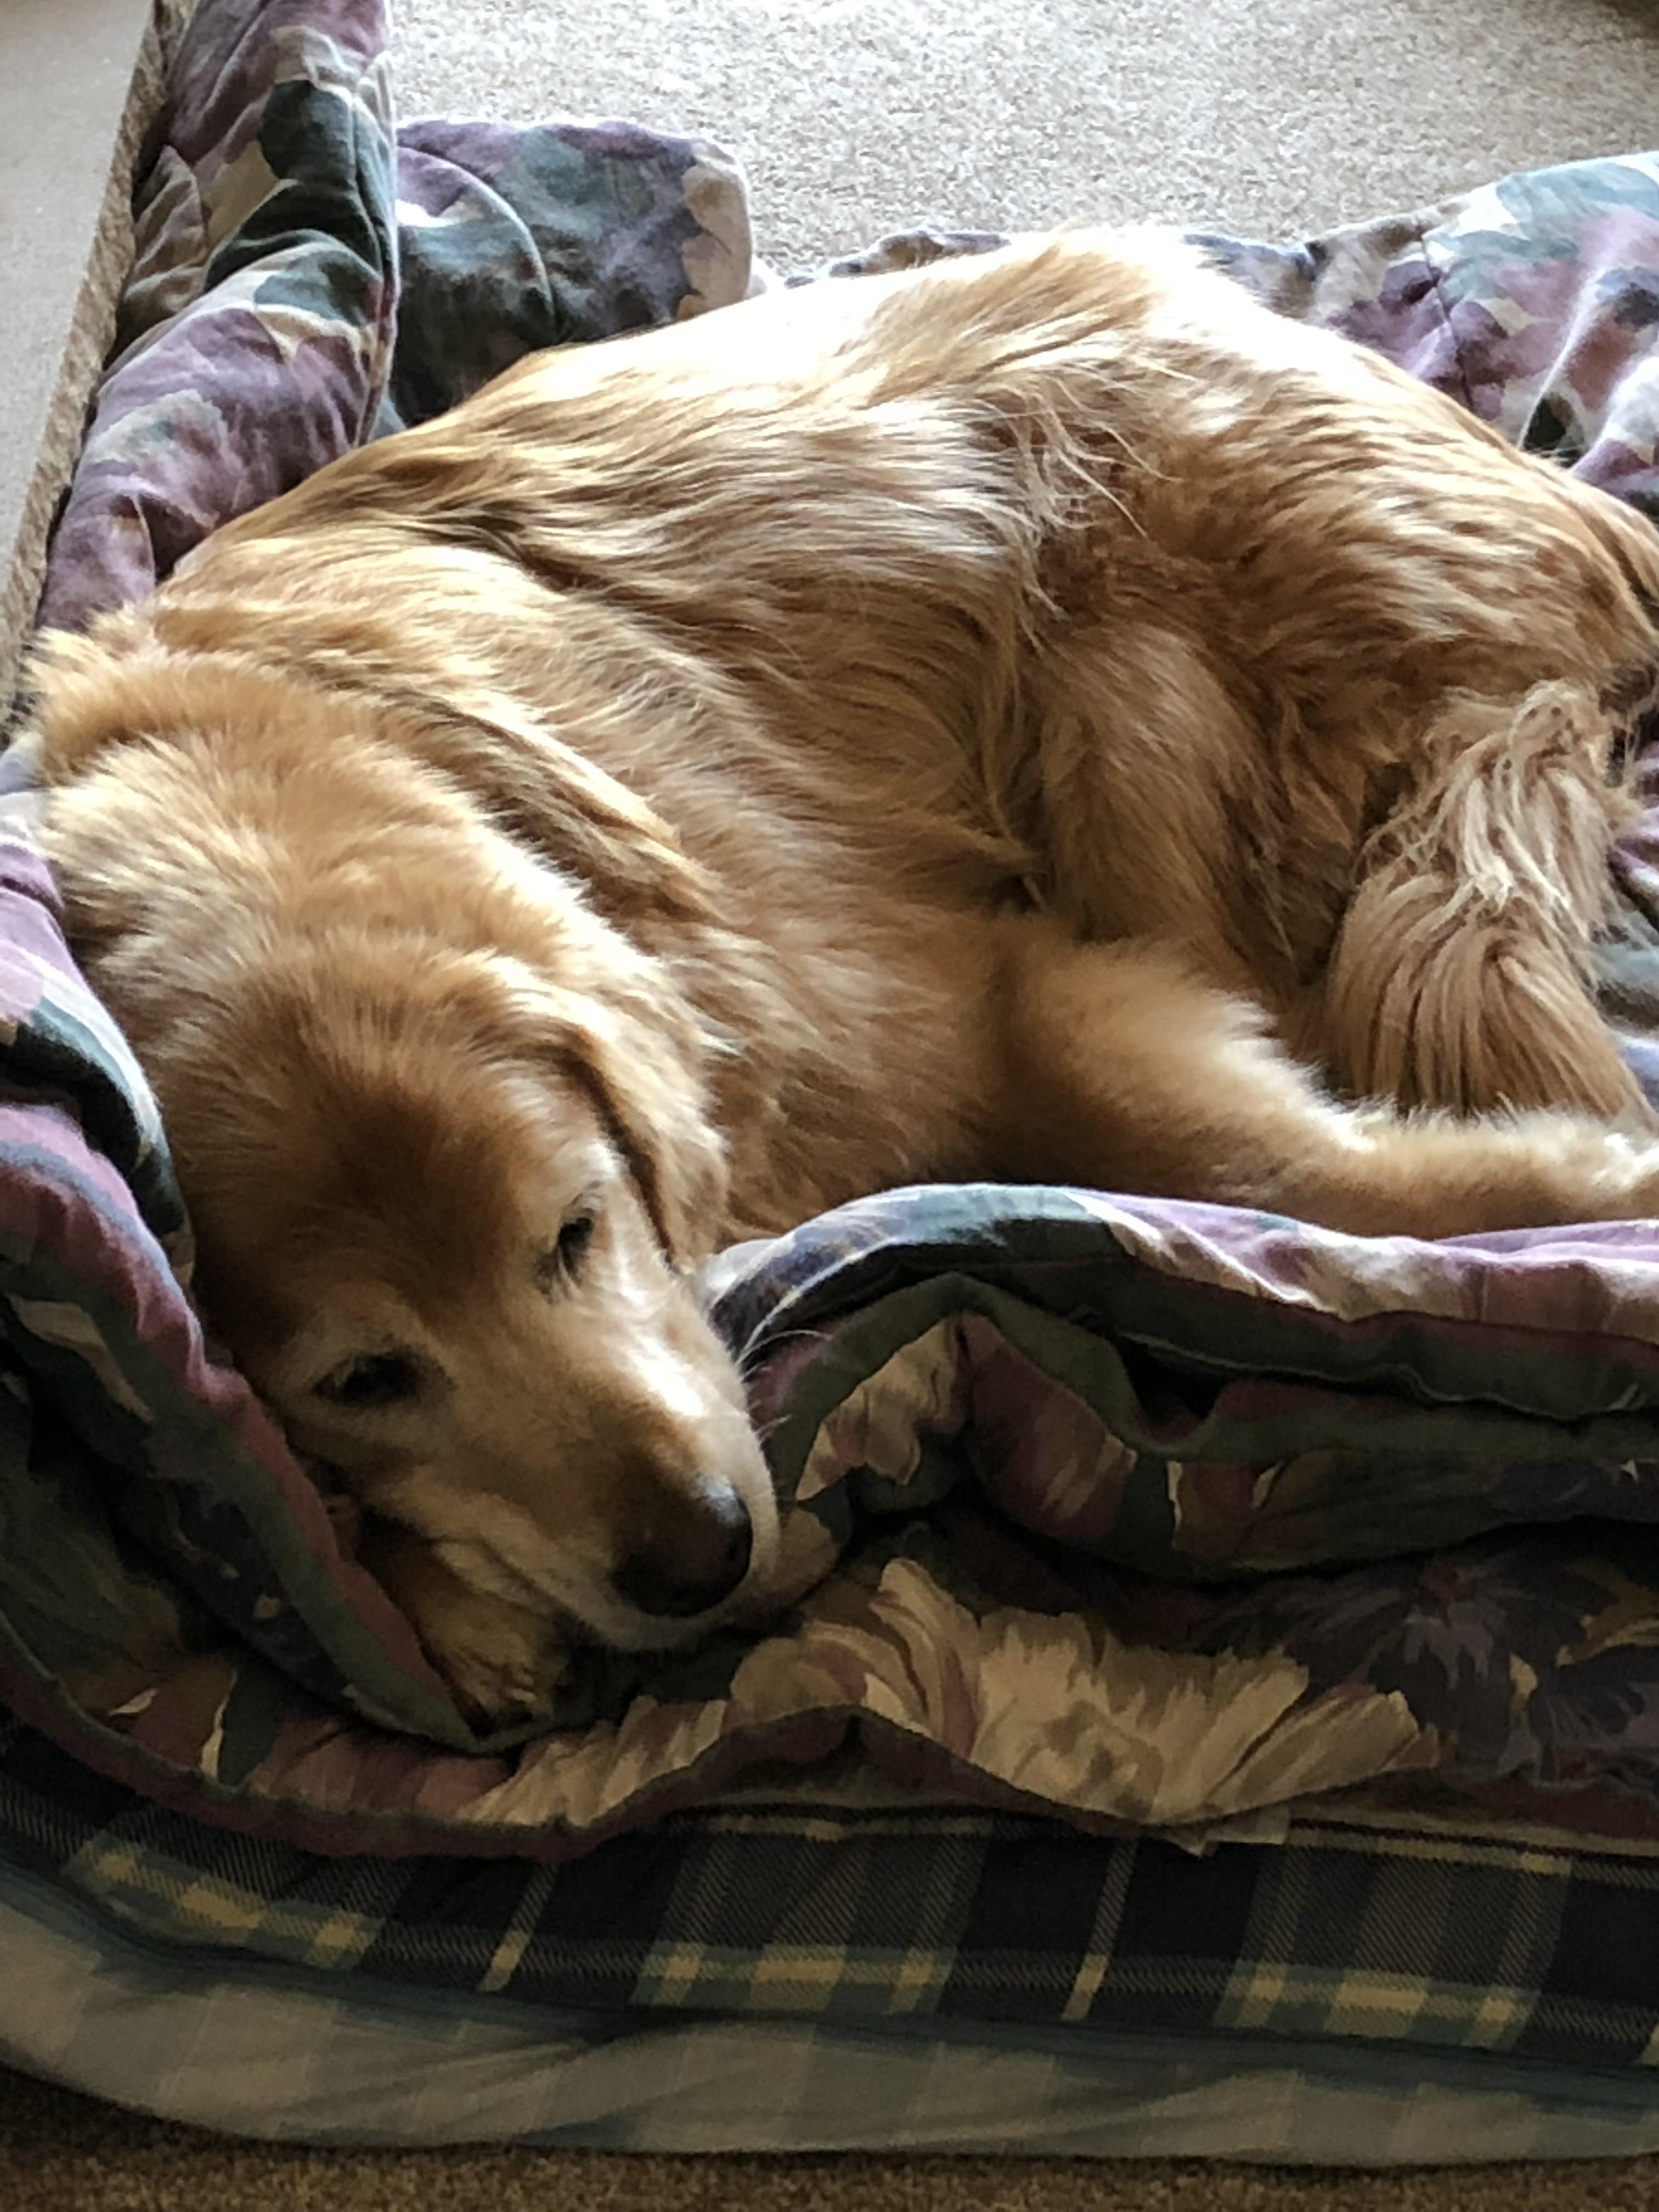 Best dog beds for seniors